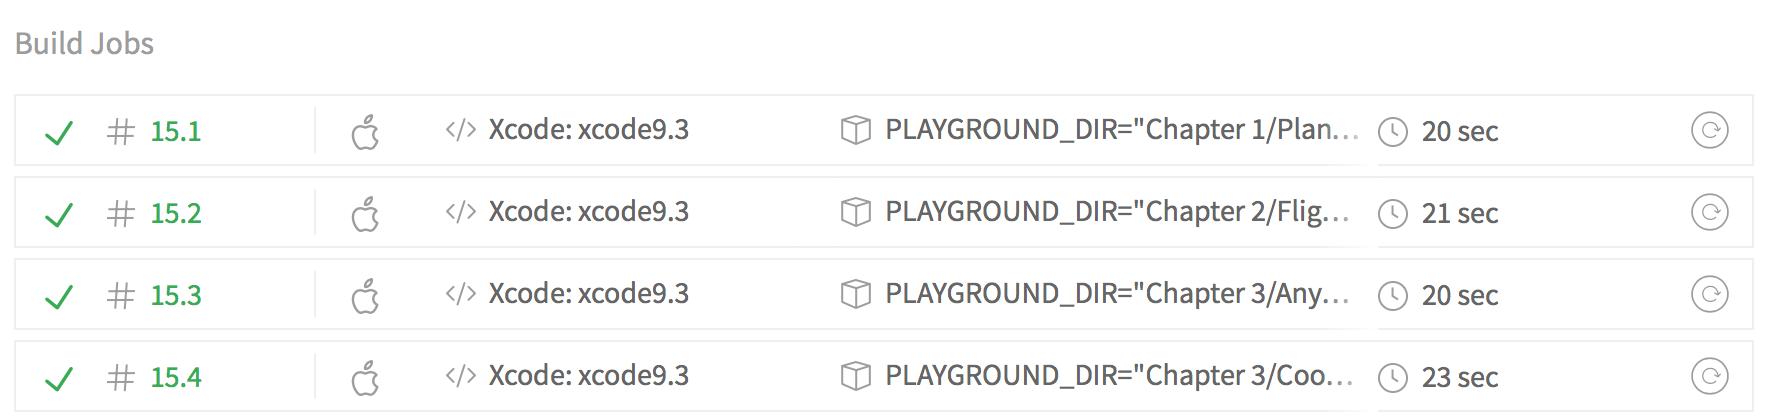 Running Xcode Playgrounds on Travis CI - Flight School